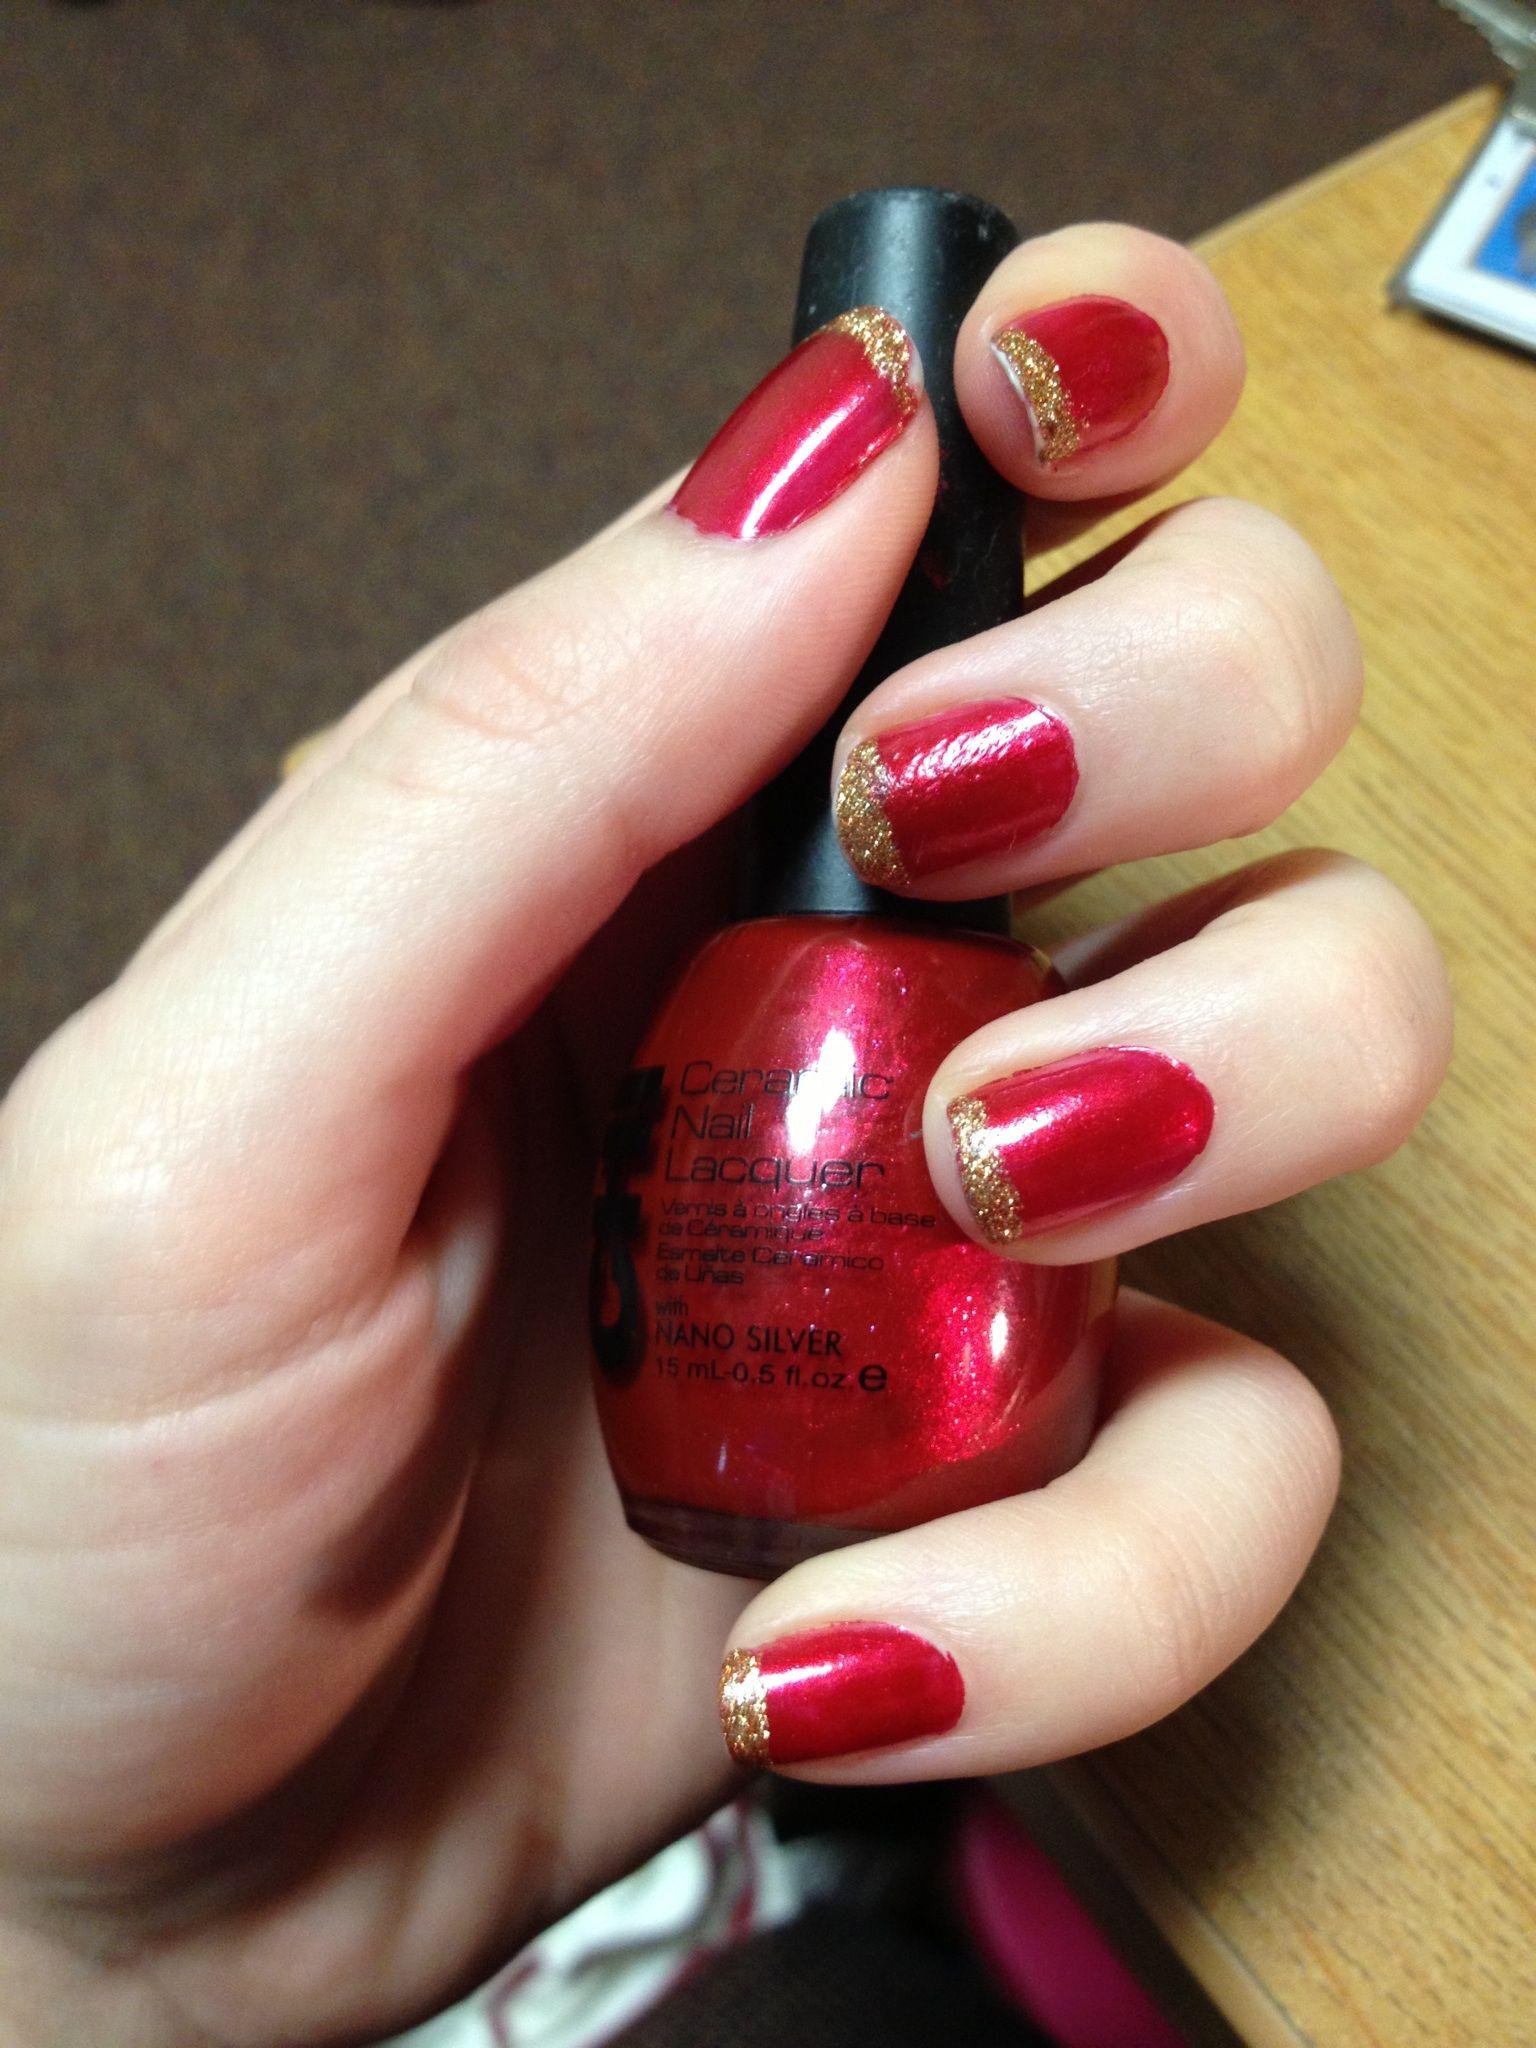 Christmas-y nails!